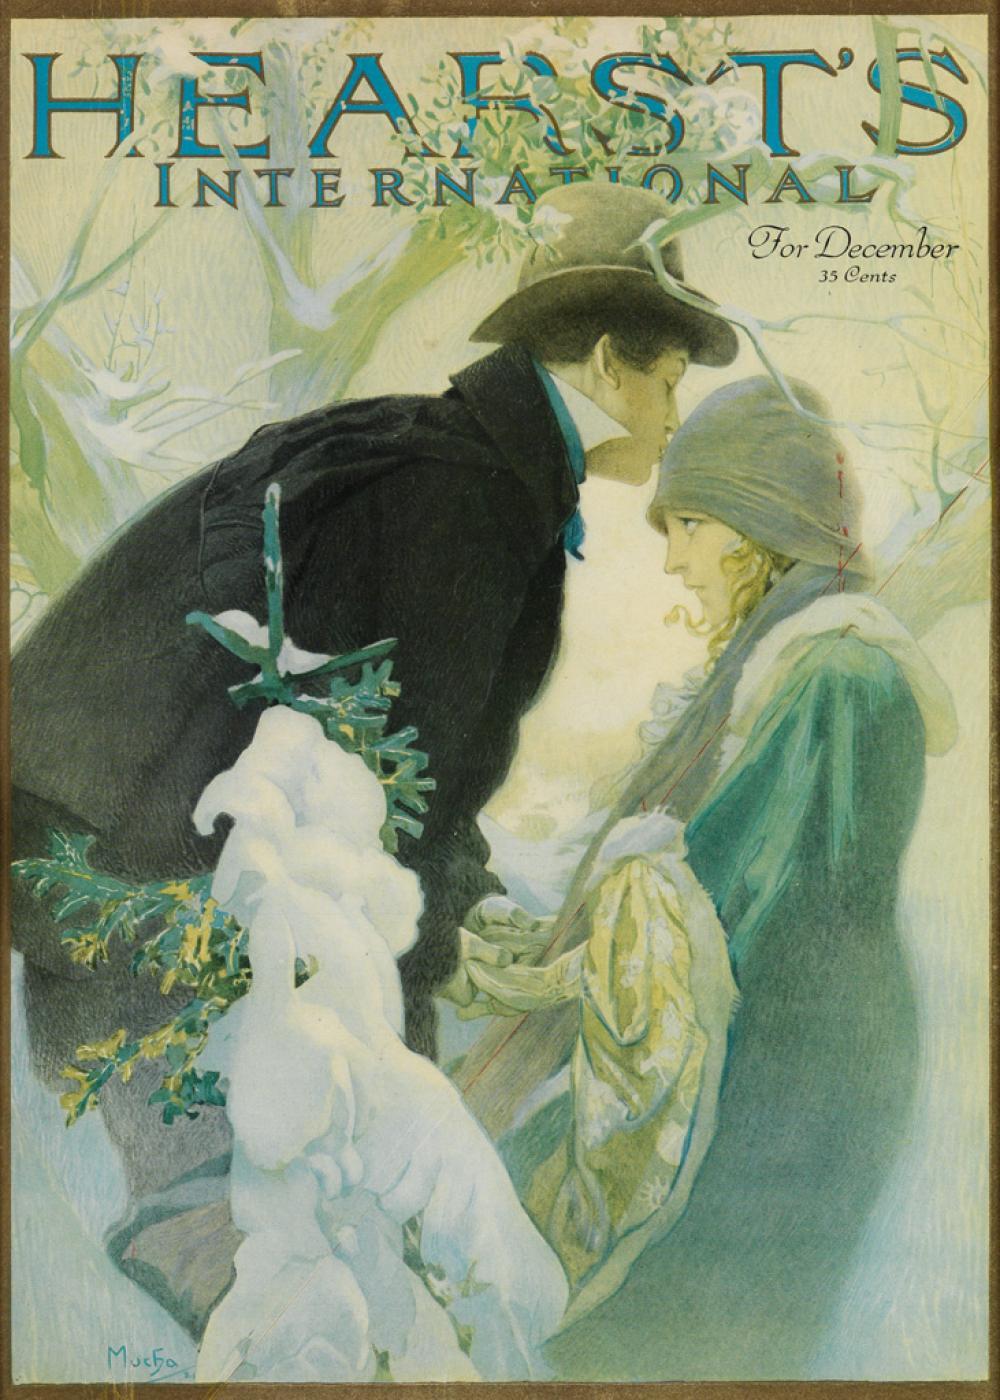 ALPHONSE MUCHA (1860-1939). HEARST''S INTERNATIONAL / FOR DECEMBER. Magazine cover. 1921. 13x9 inches, 34x24 cm.